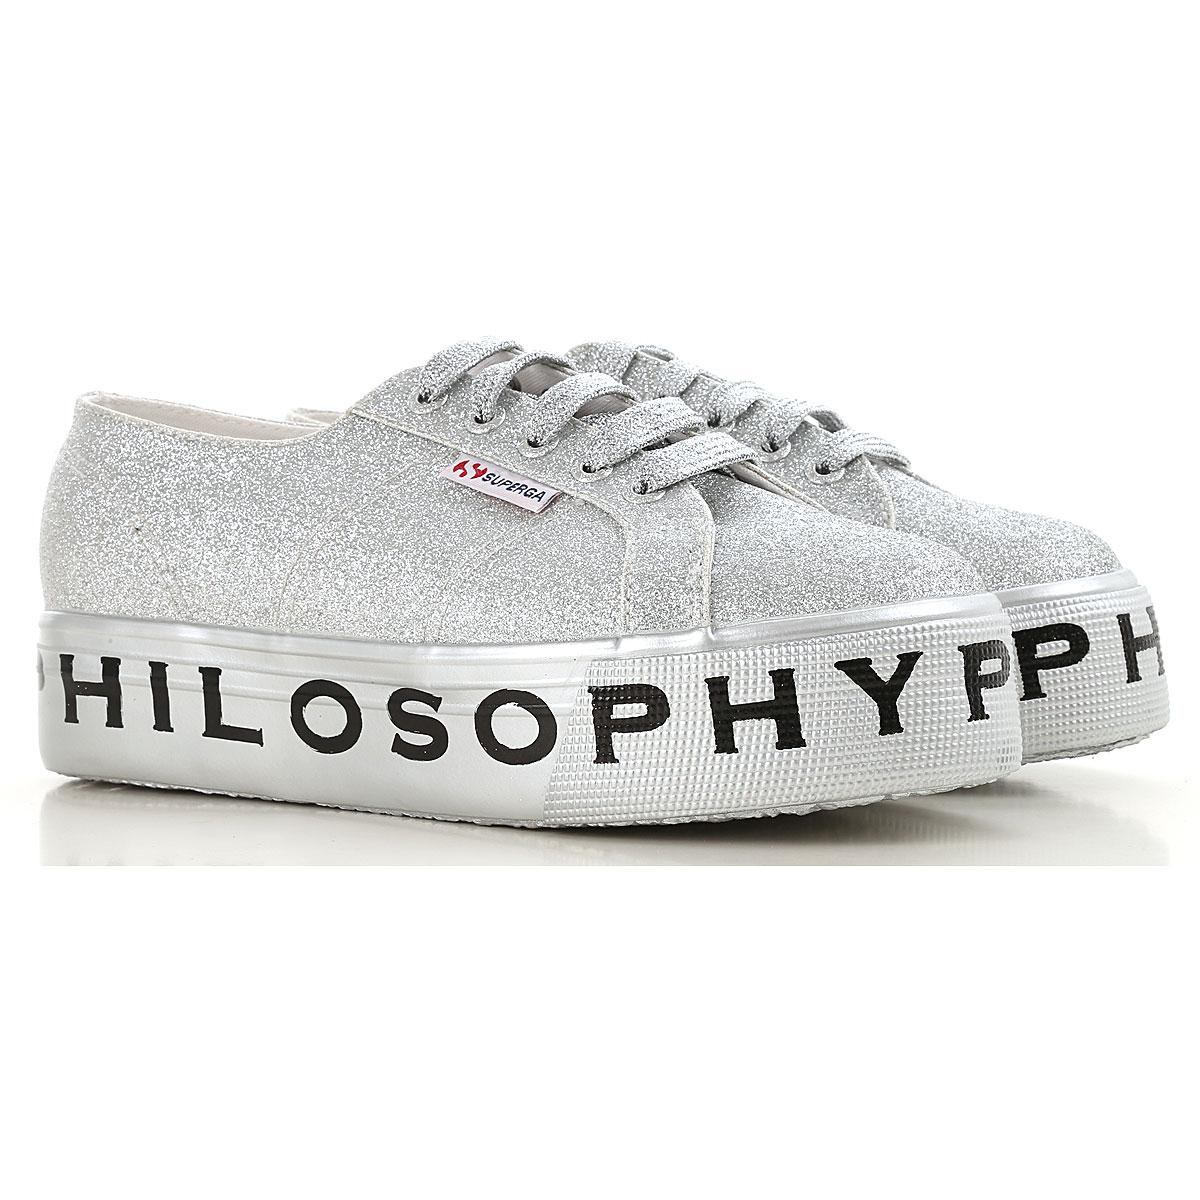 Image of Superga Sneakers for Women, Superga X Philosophy, Silver, Glitter, 2017, ITA 38 - USA 7.5 - UK 5 ITA 39 - USA 8.5 - UK 6 ITA 35 - USA 4.5 - UK 2 ITA 36 - USA 5.5 - UK 3 ITA 37 - USA 6.5 - UK 4